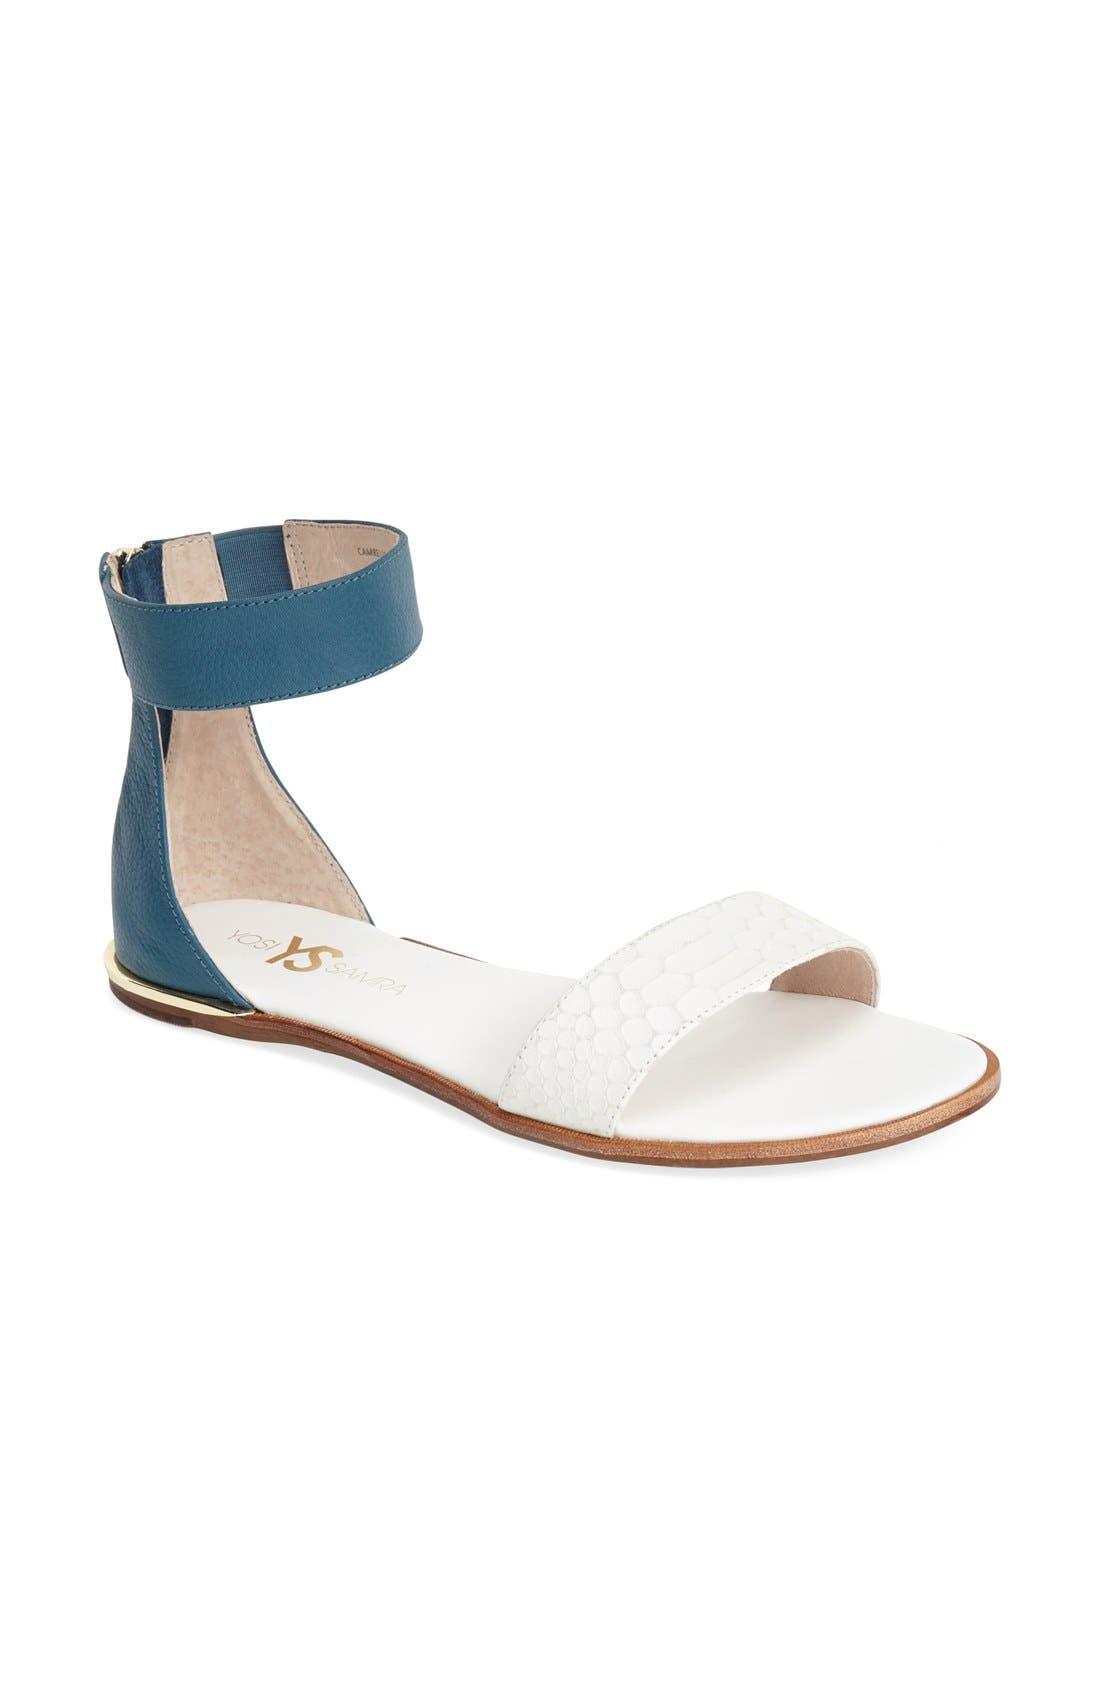 ,                             'Cambelle' Ankle Strap Sandal,                             Alternate thumbnail 19, color,                             103